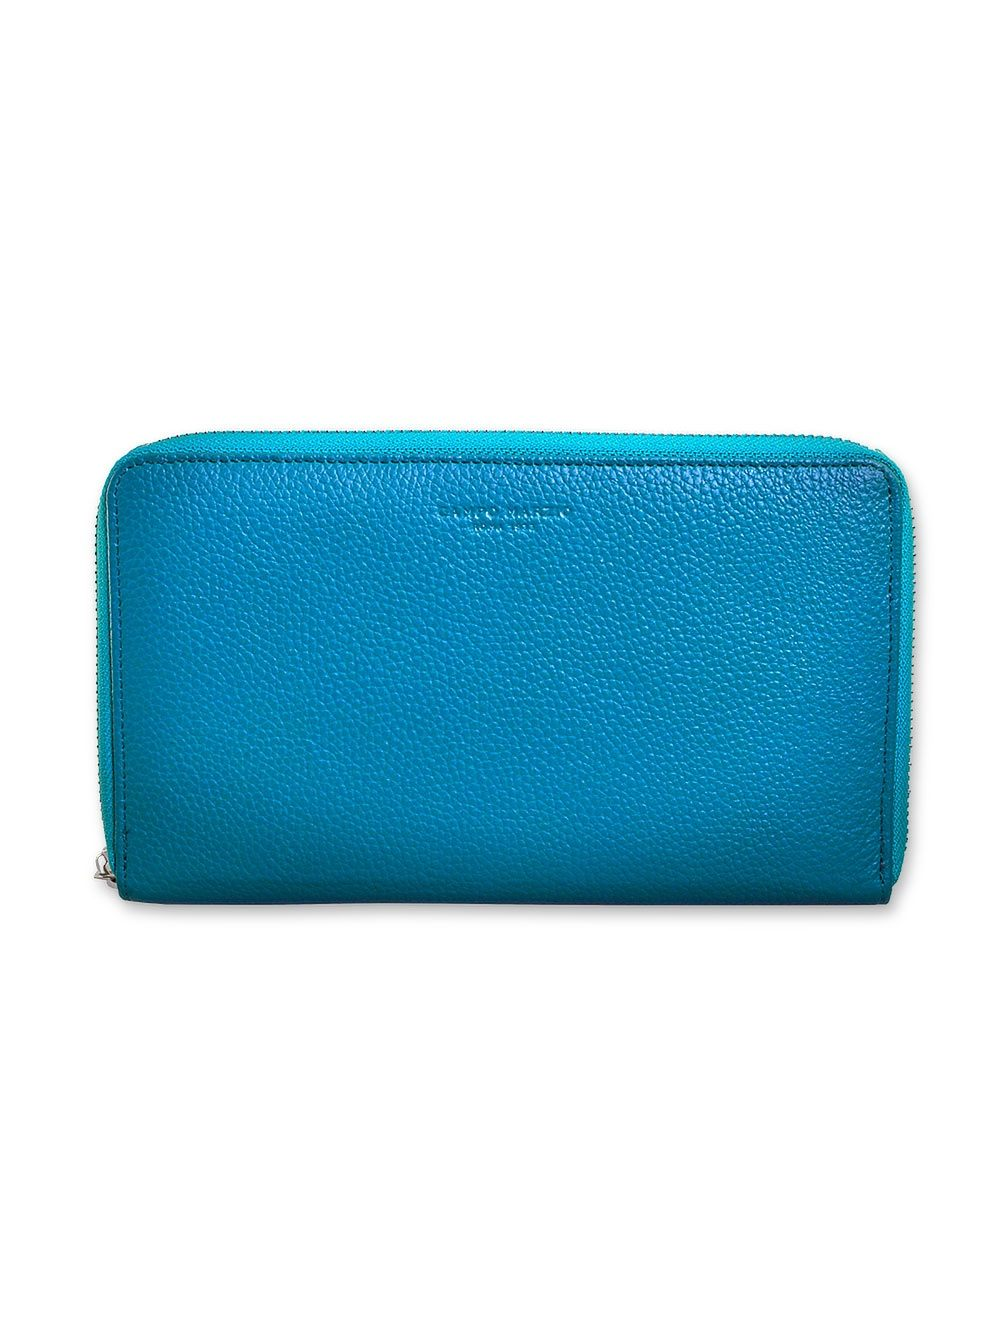 Princeton Wallet